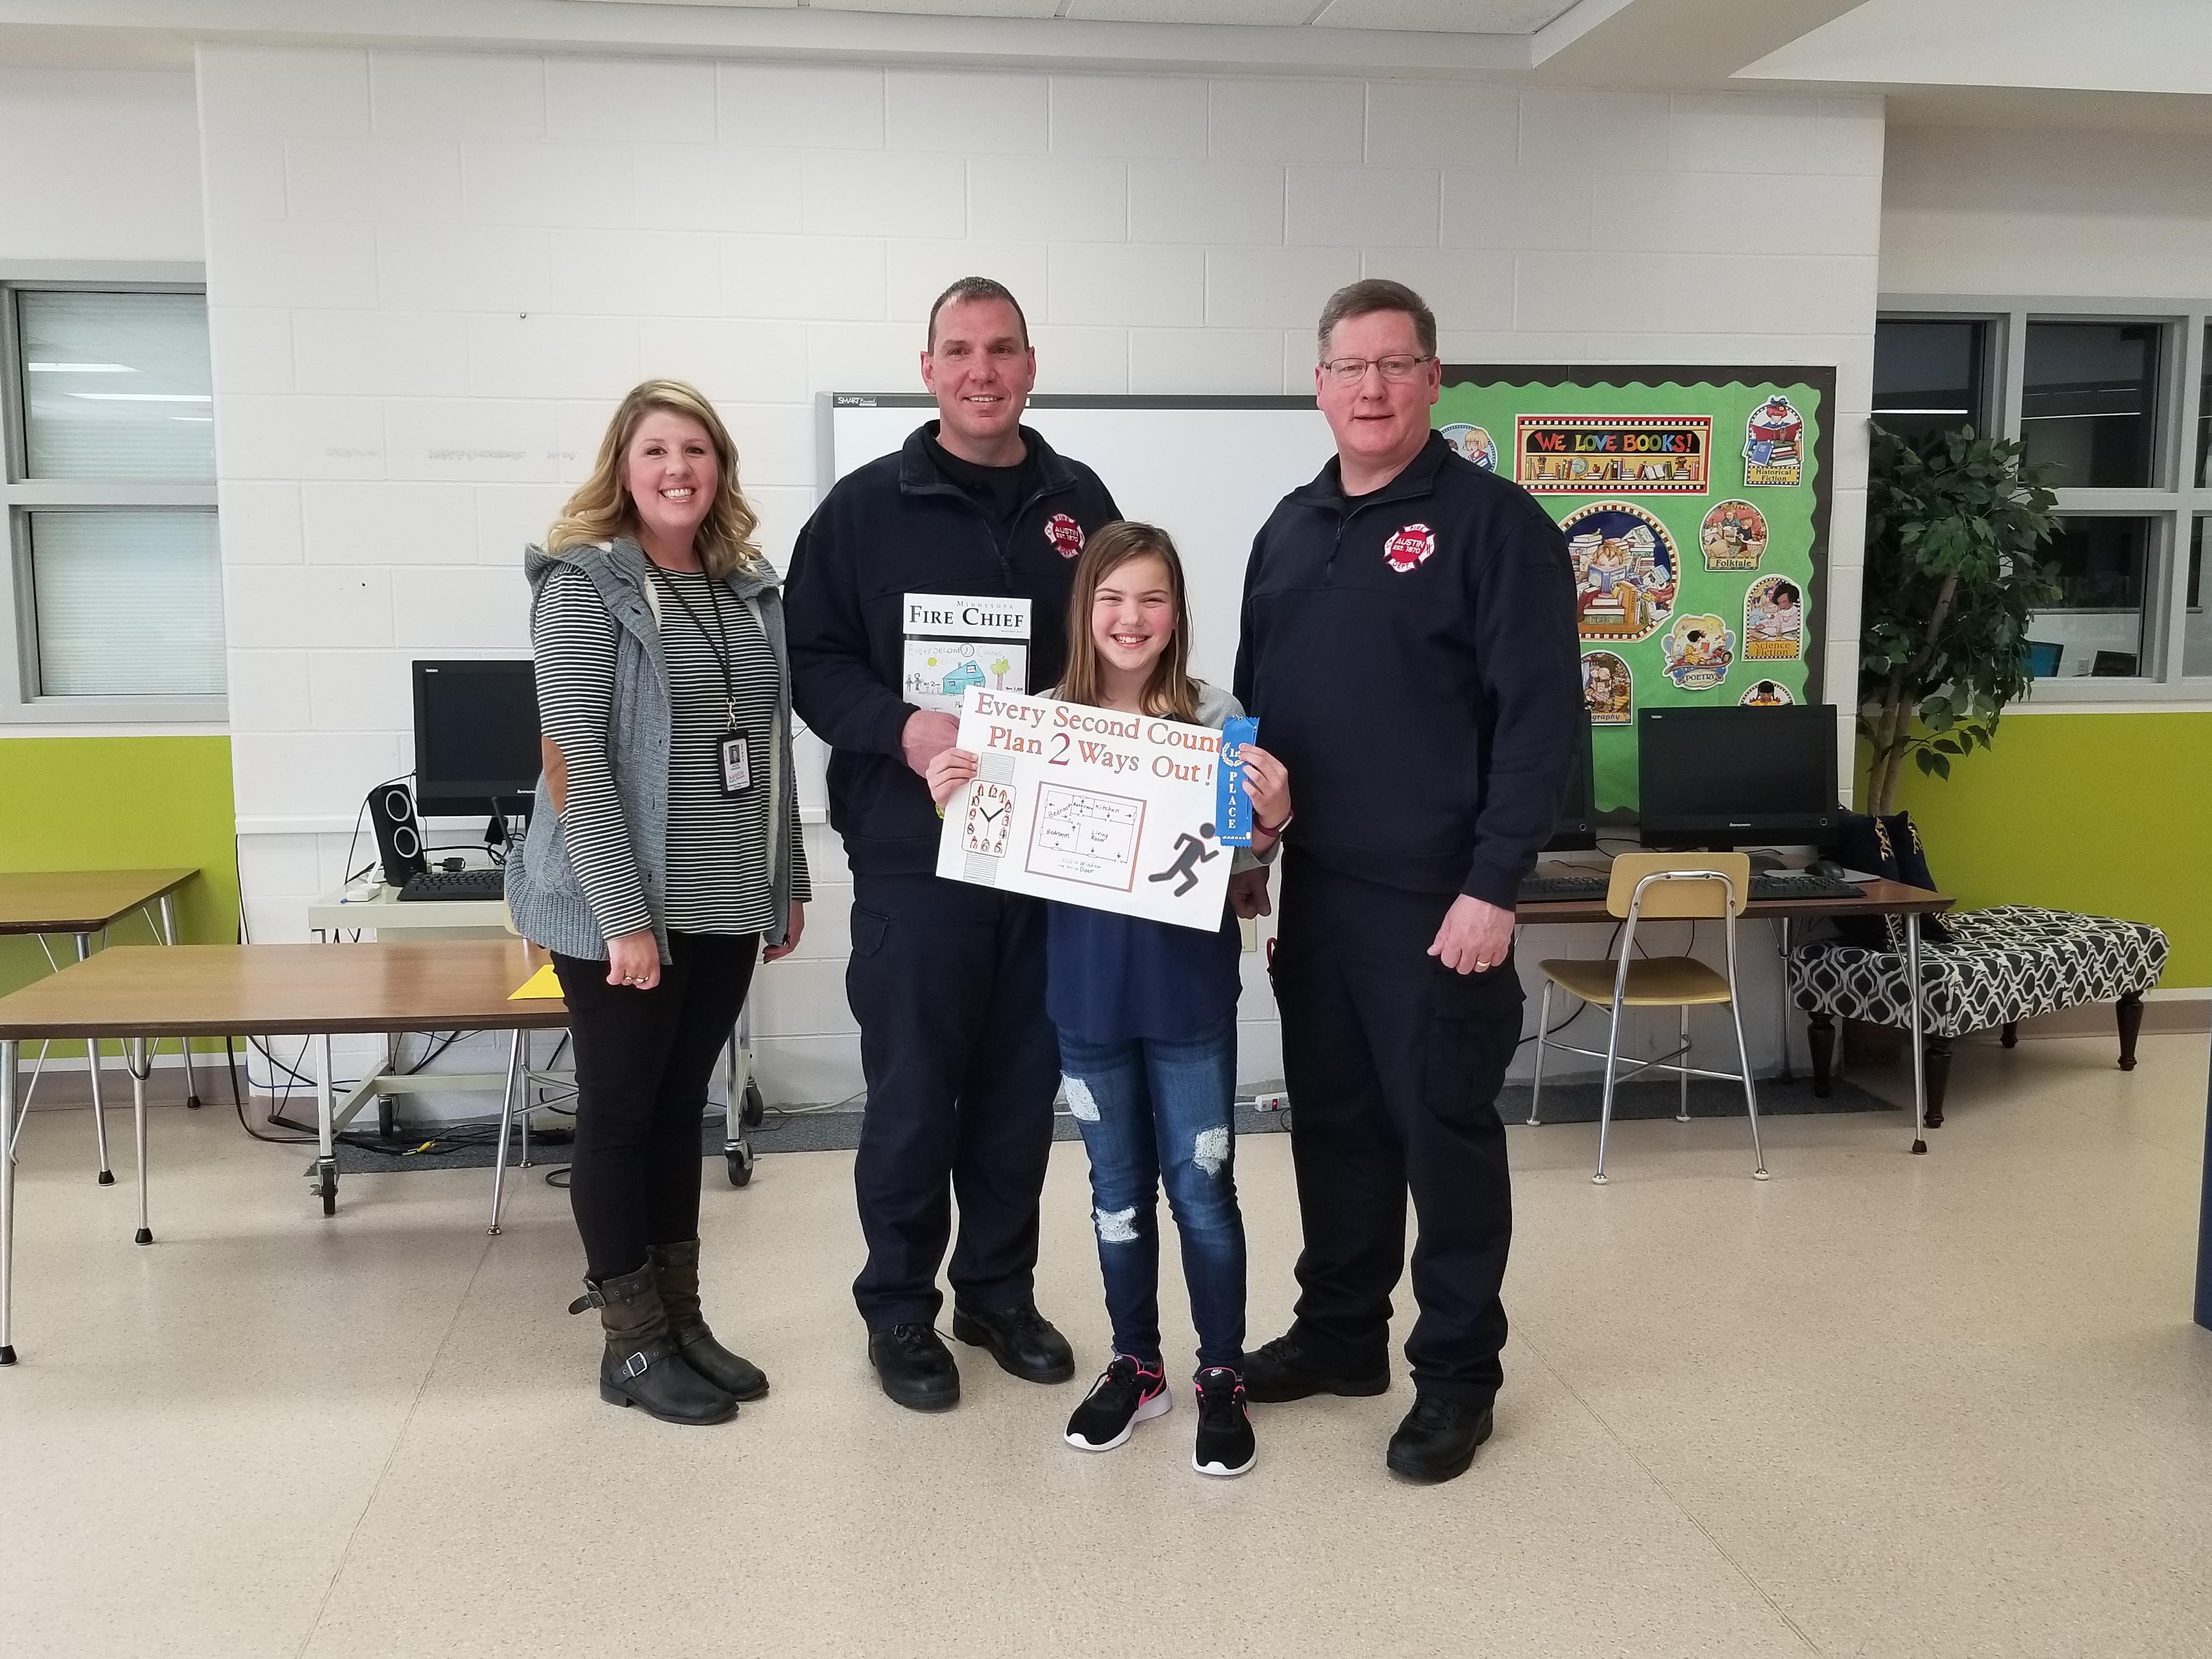 Principal Katie Baskin, Chief, Rachel & Hansen